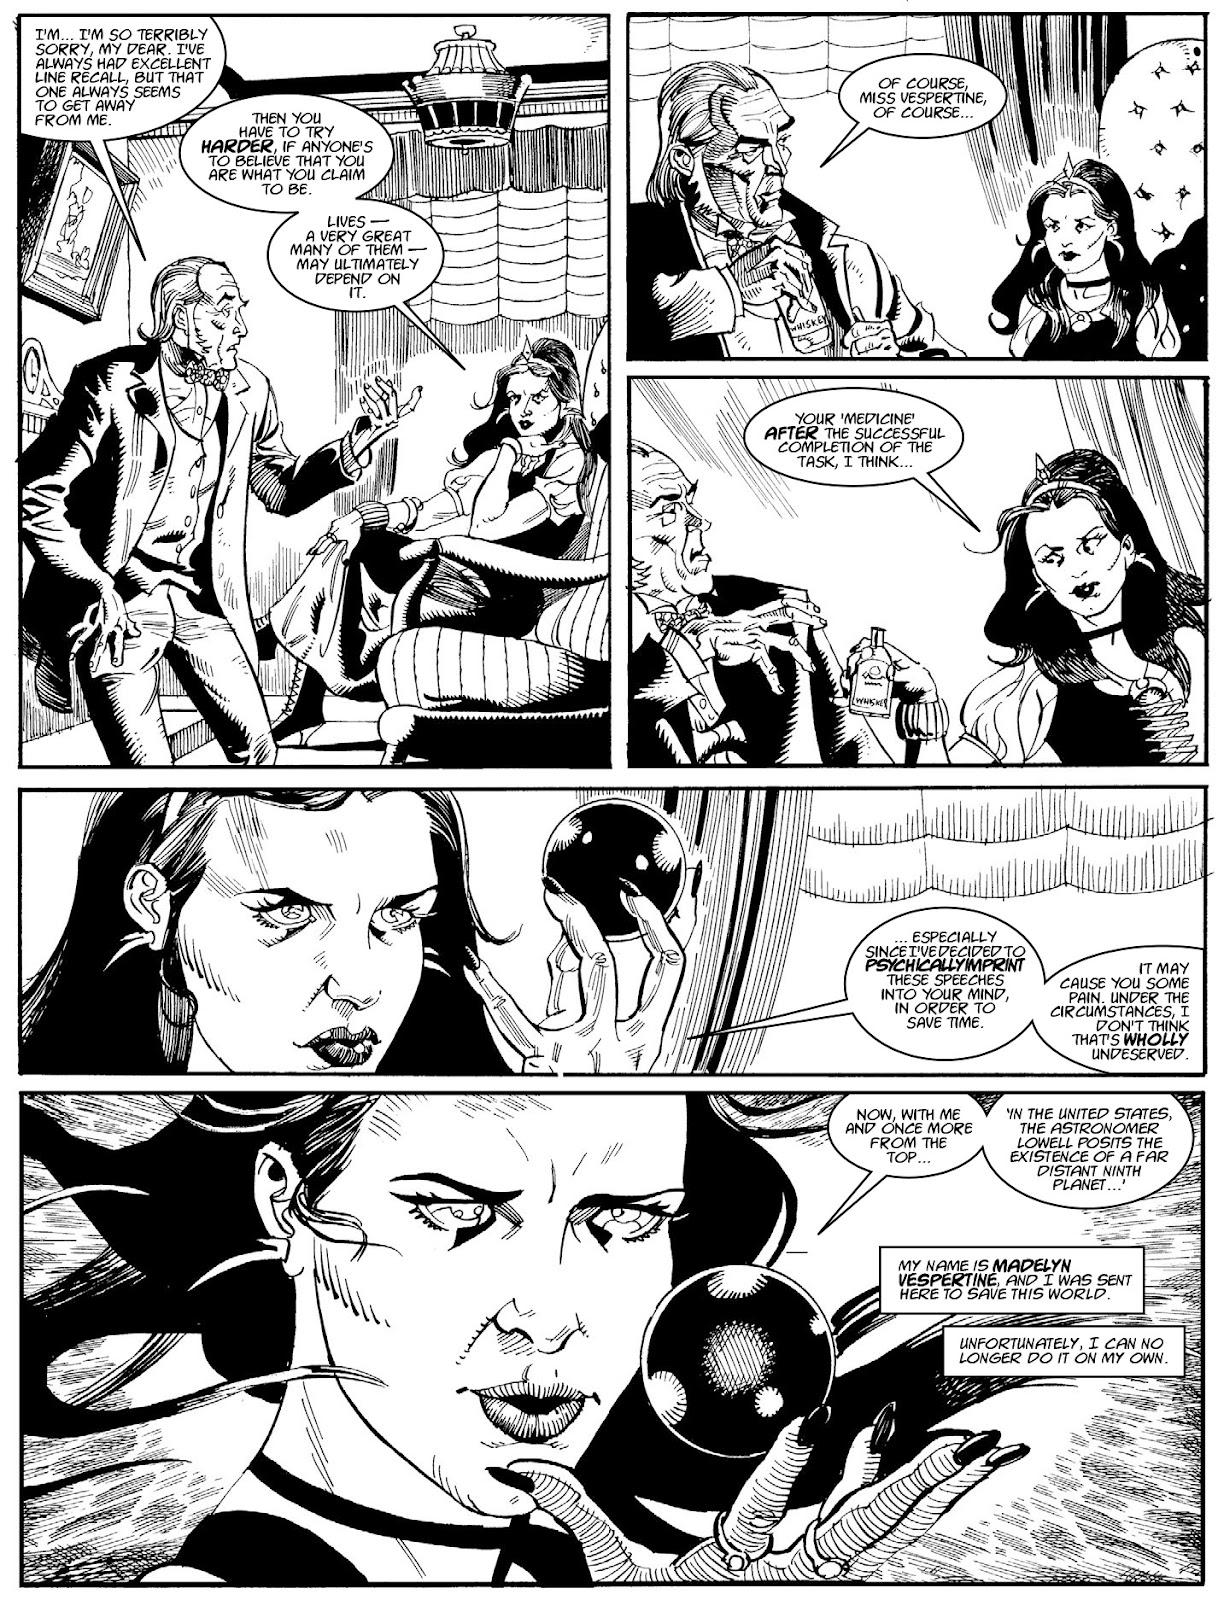 Judge Dredd Megazine (Vol. 5) issue 427 - Page 68